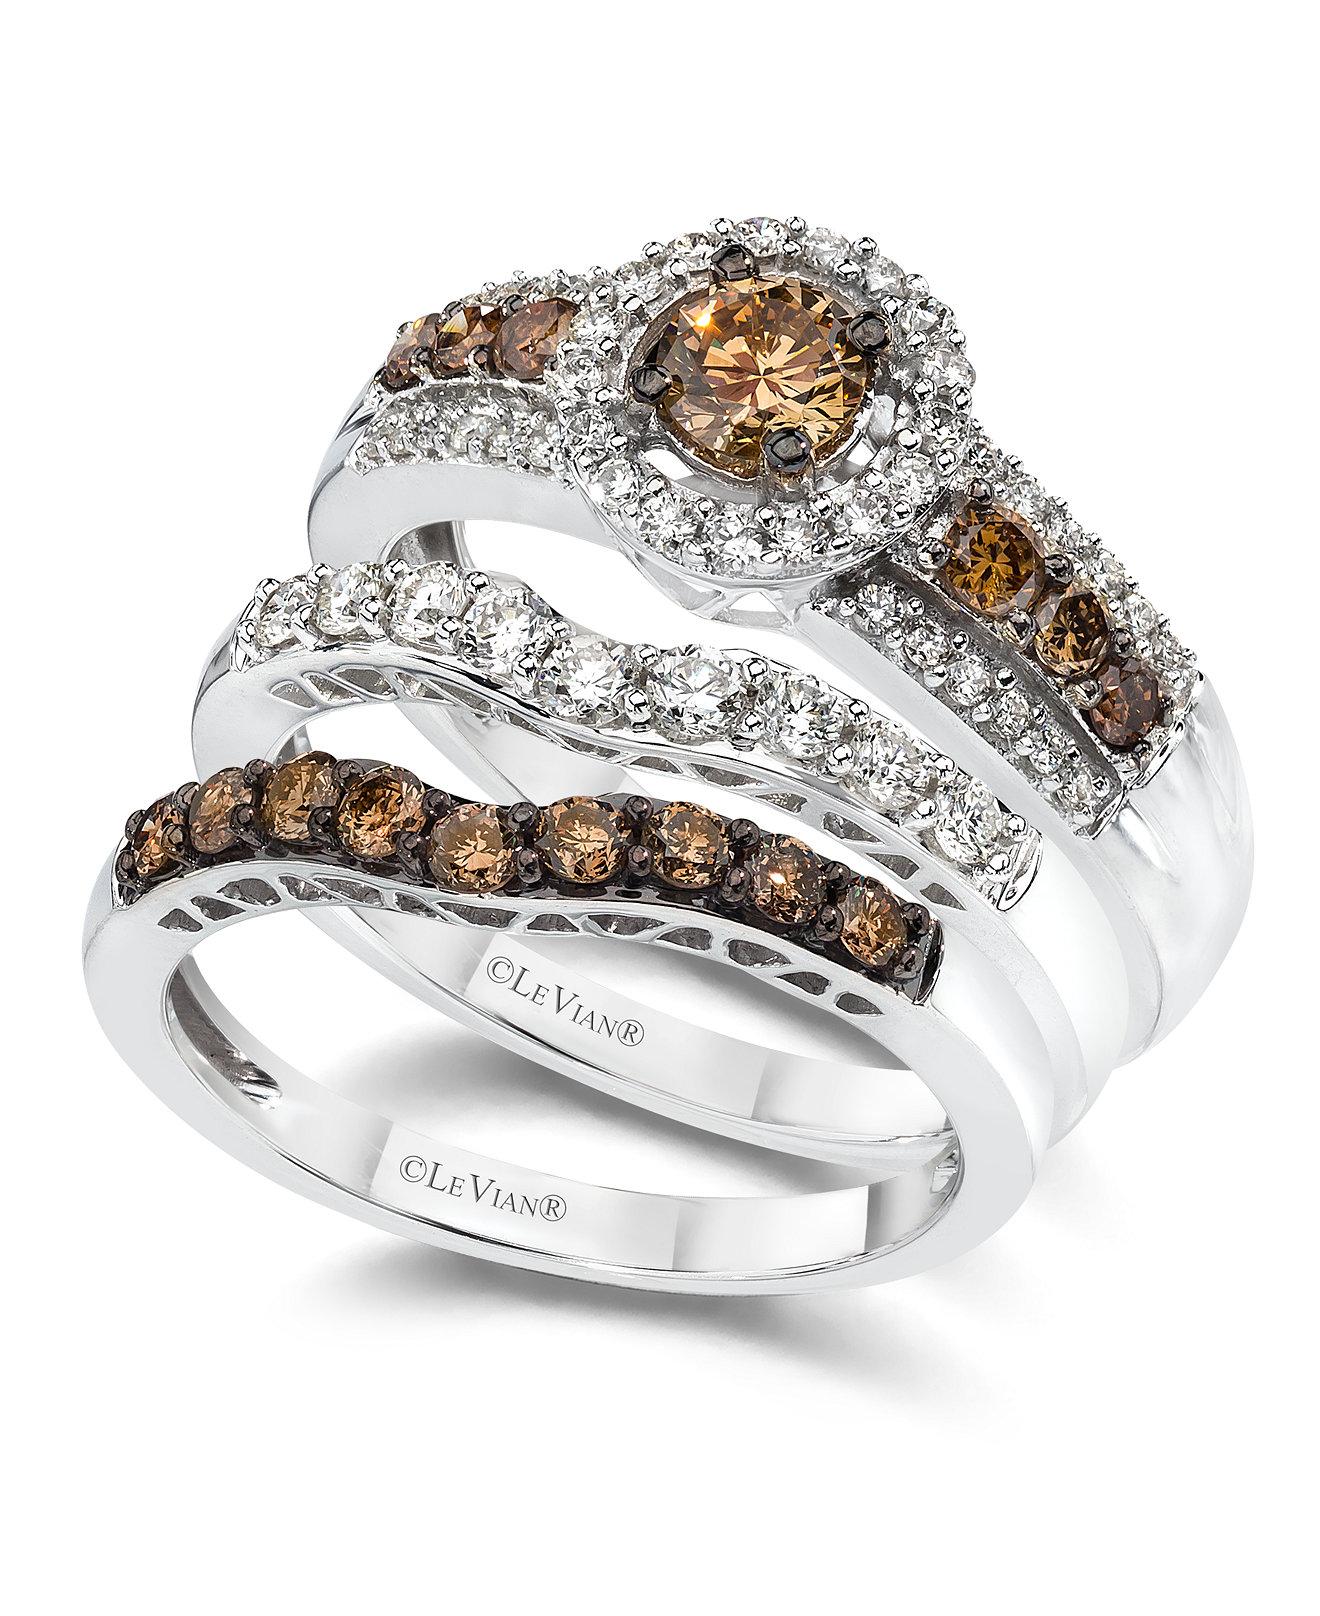 Le Vian Diamond Stackable Rings In 14k White Gold